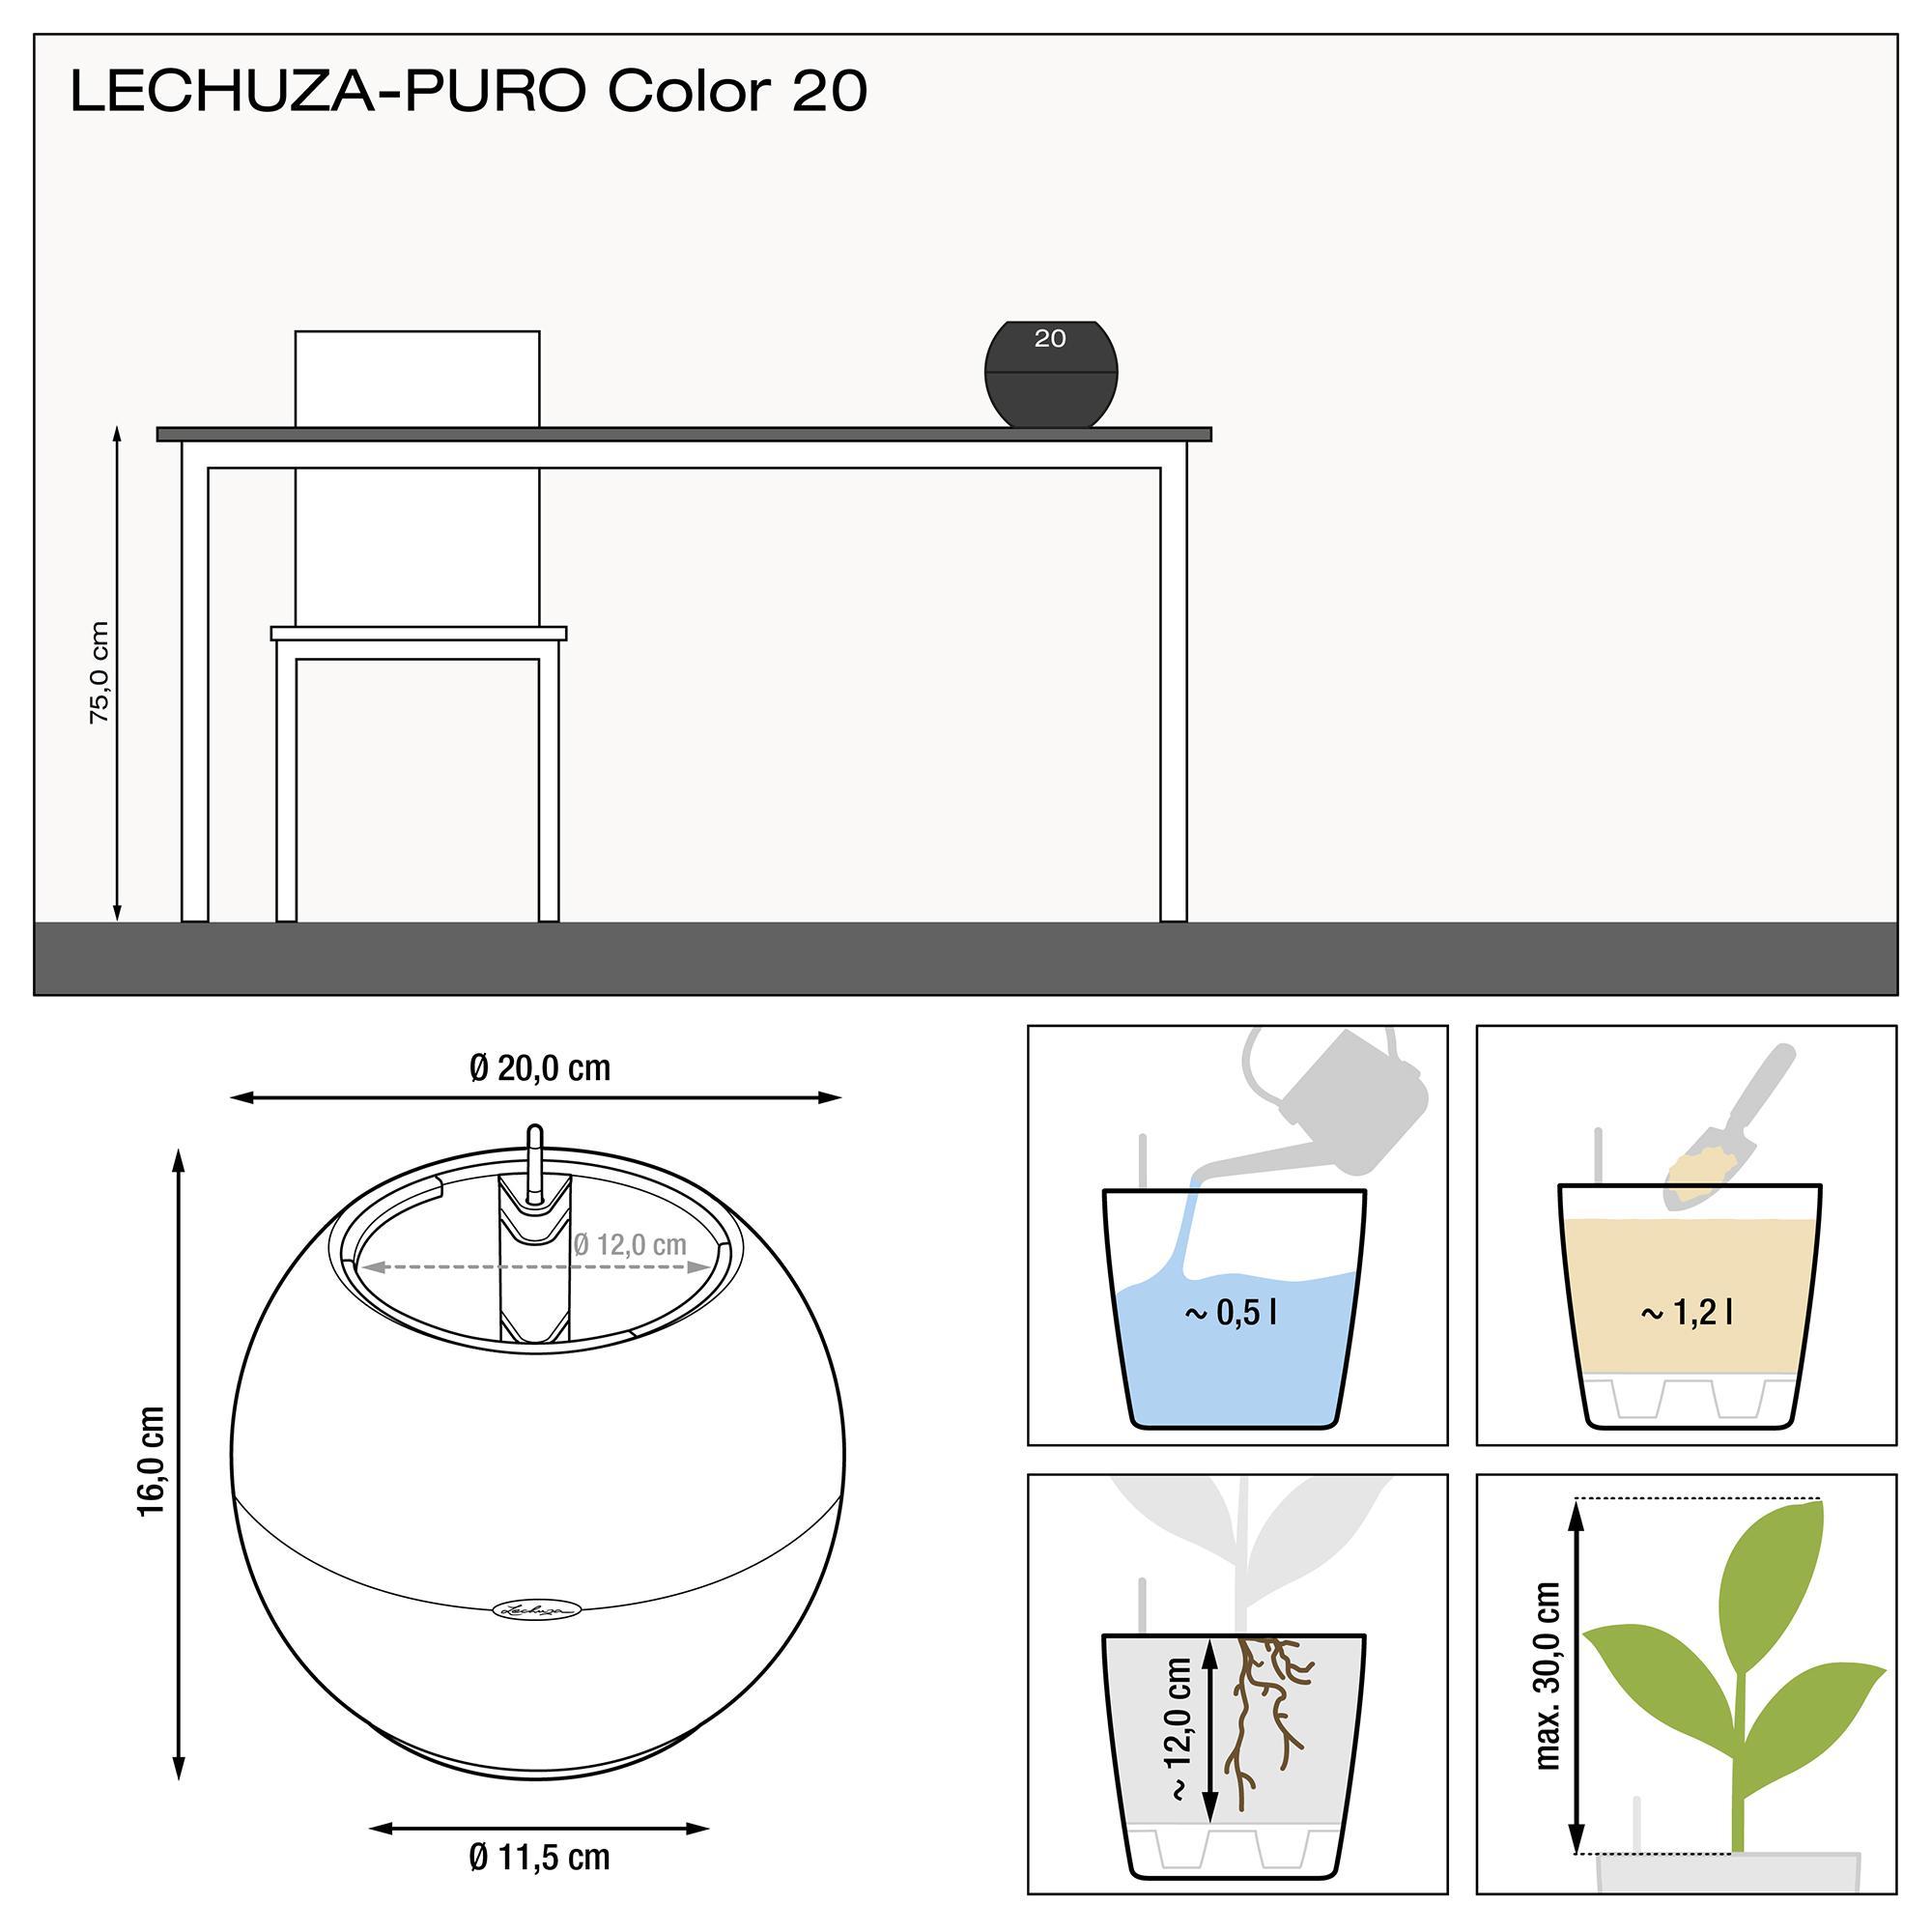 LECHUZA-PURO Color 20 wit - Image 3